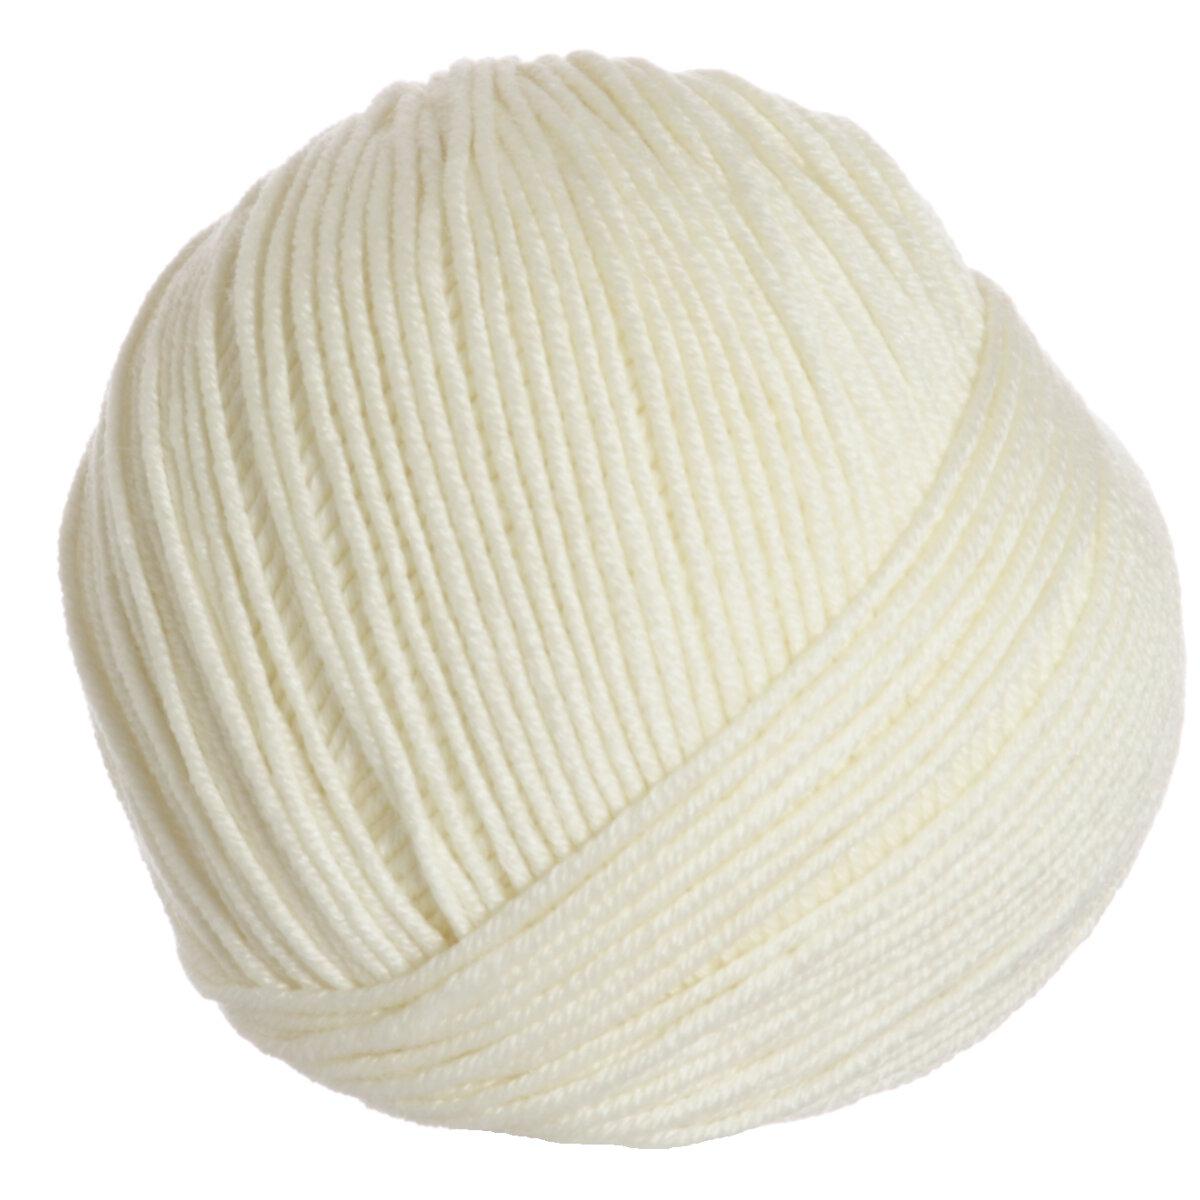 df94be14831 Sublime Baby Cashmere Merino Silk DK Yarn - 003 Vanilla at Jimmy ...